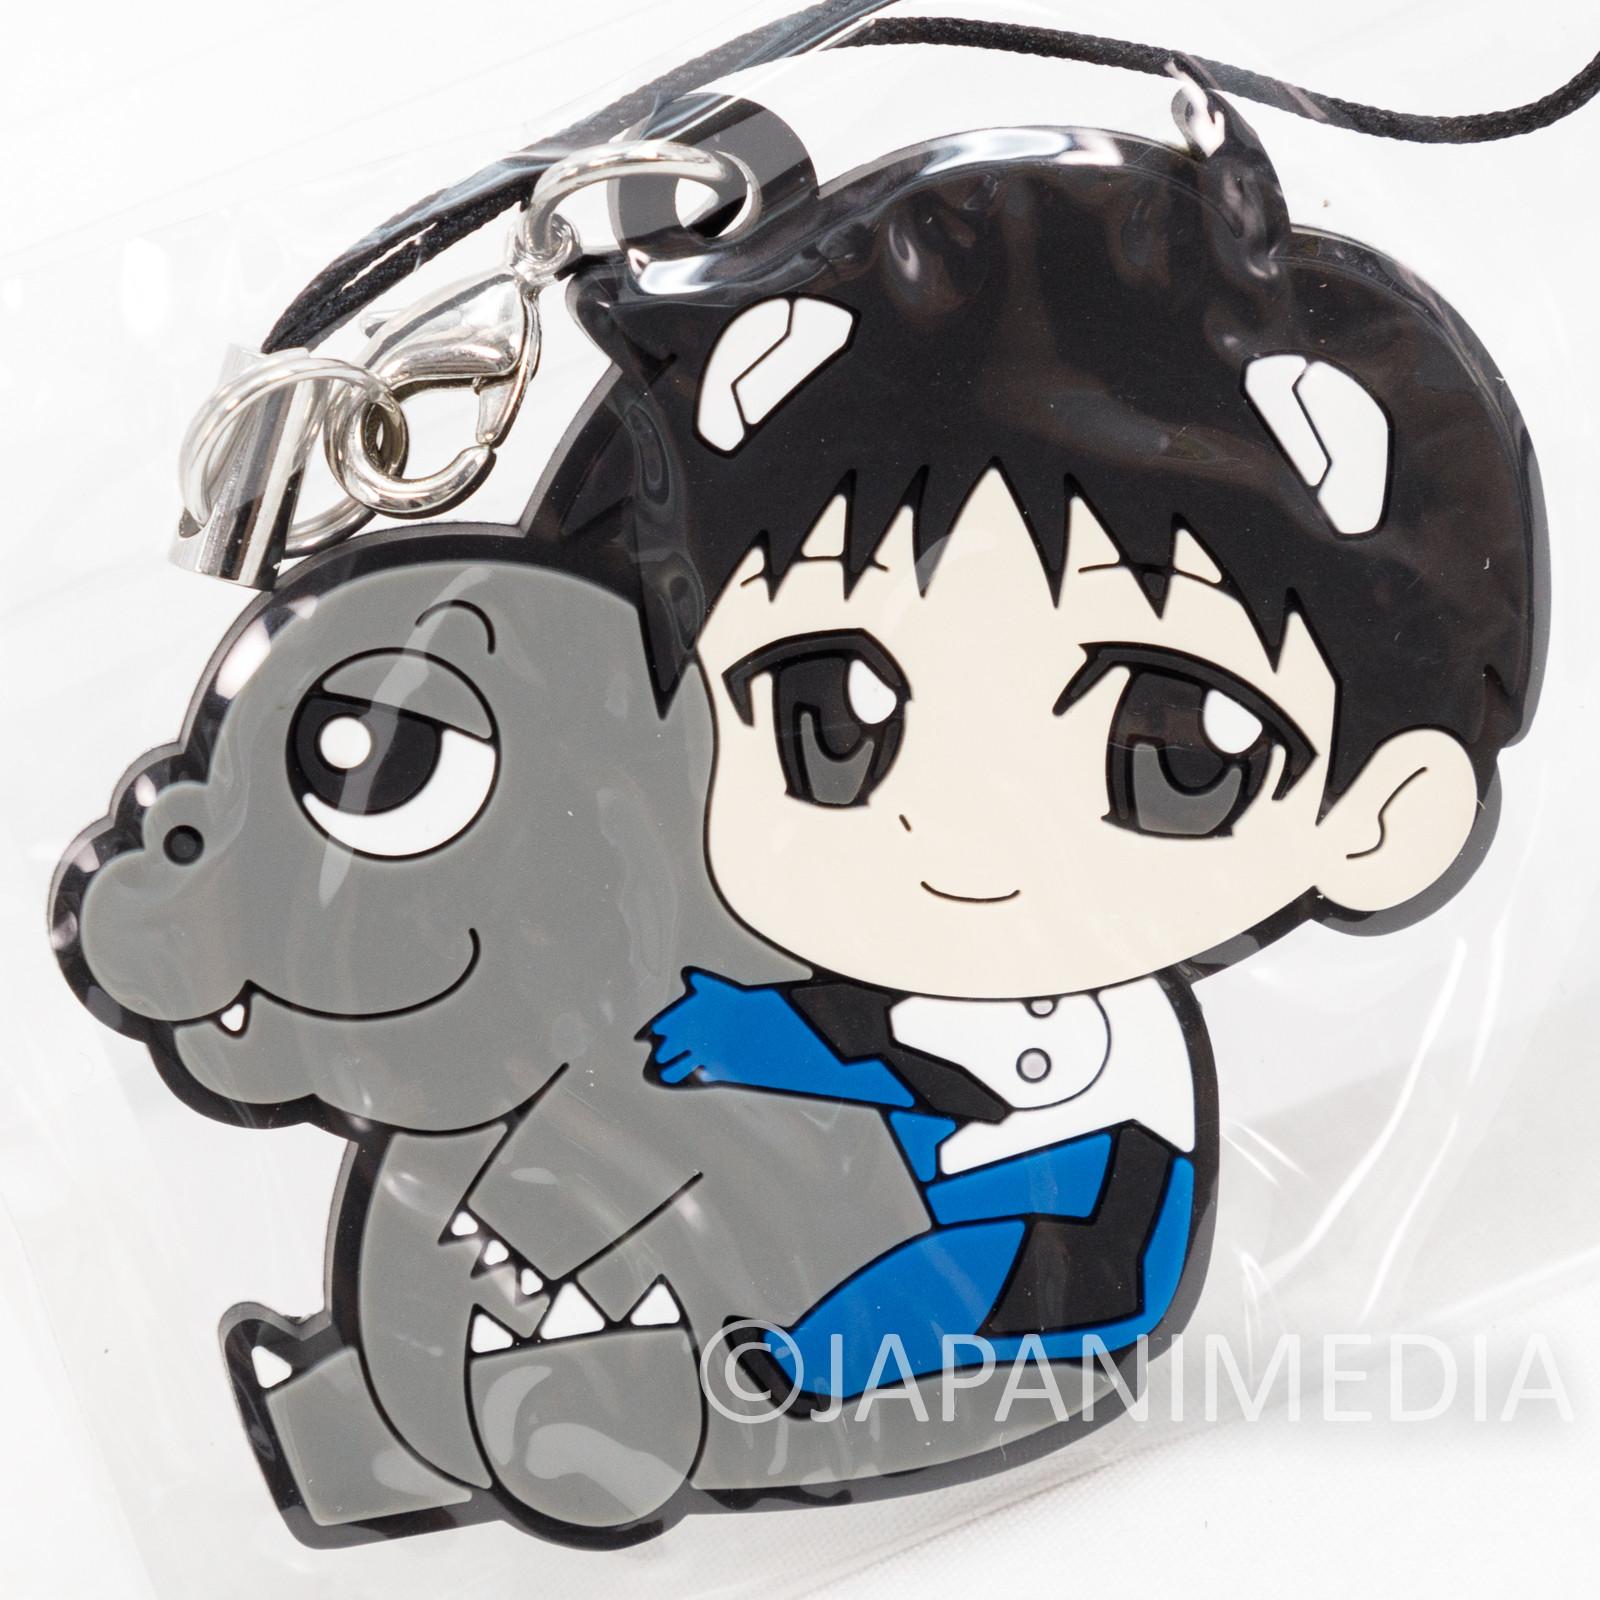 Evangelion Shinji Ikari x Minilla Mascot Rubber Strap JAPAN